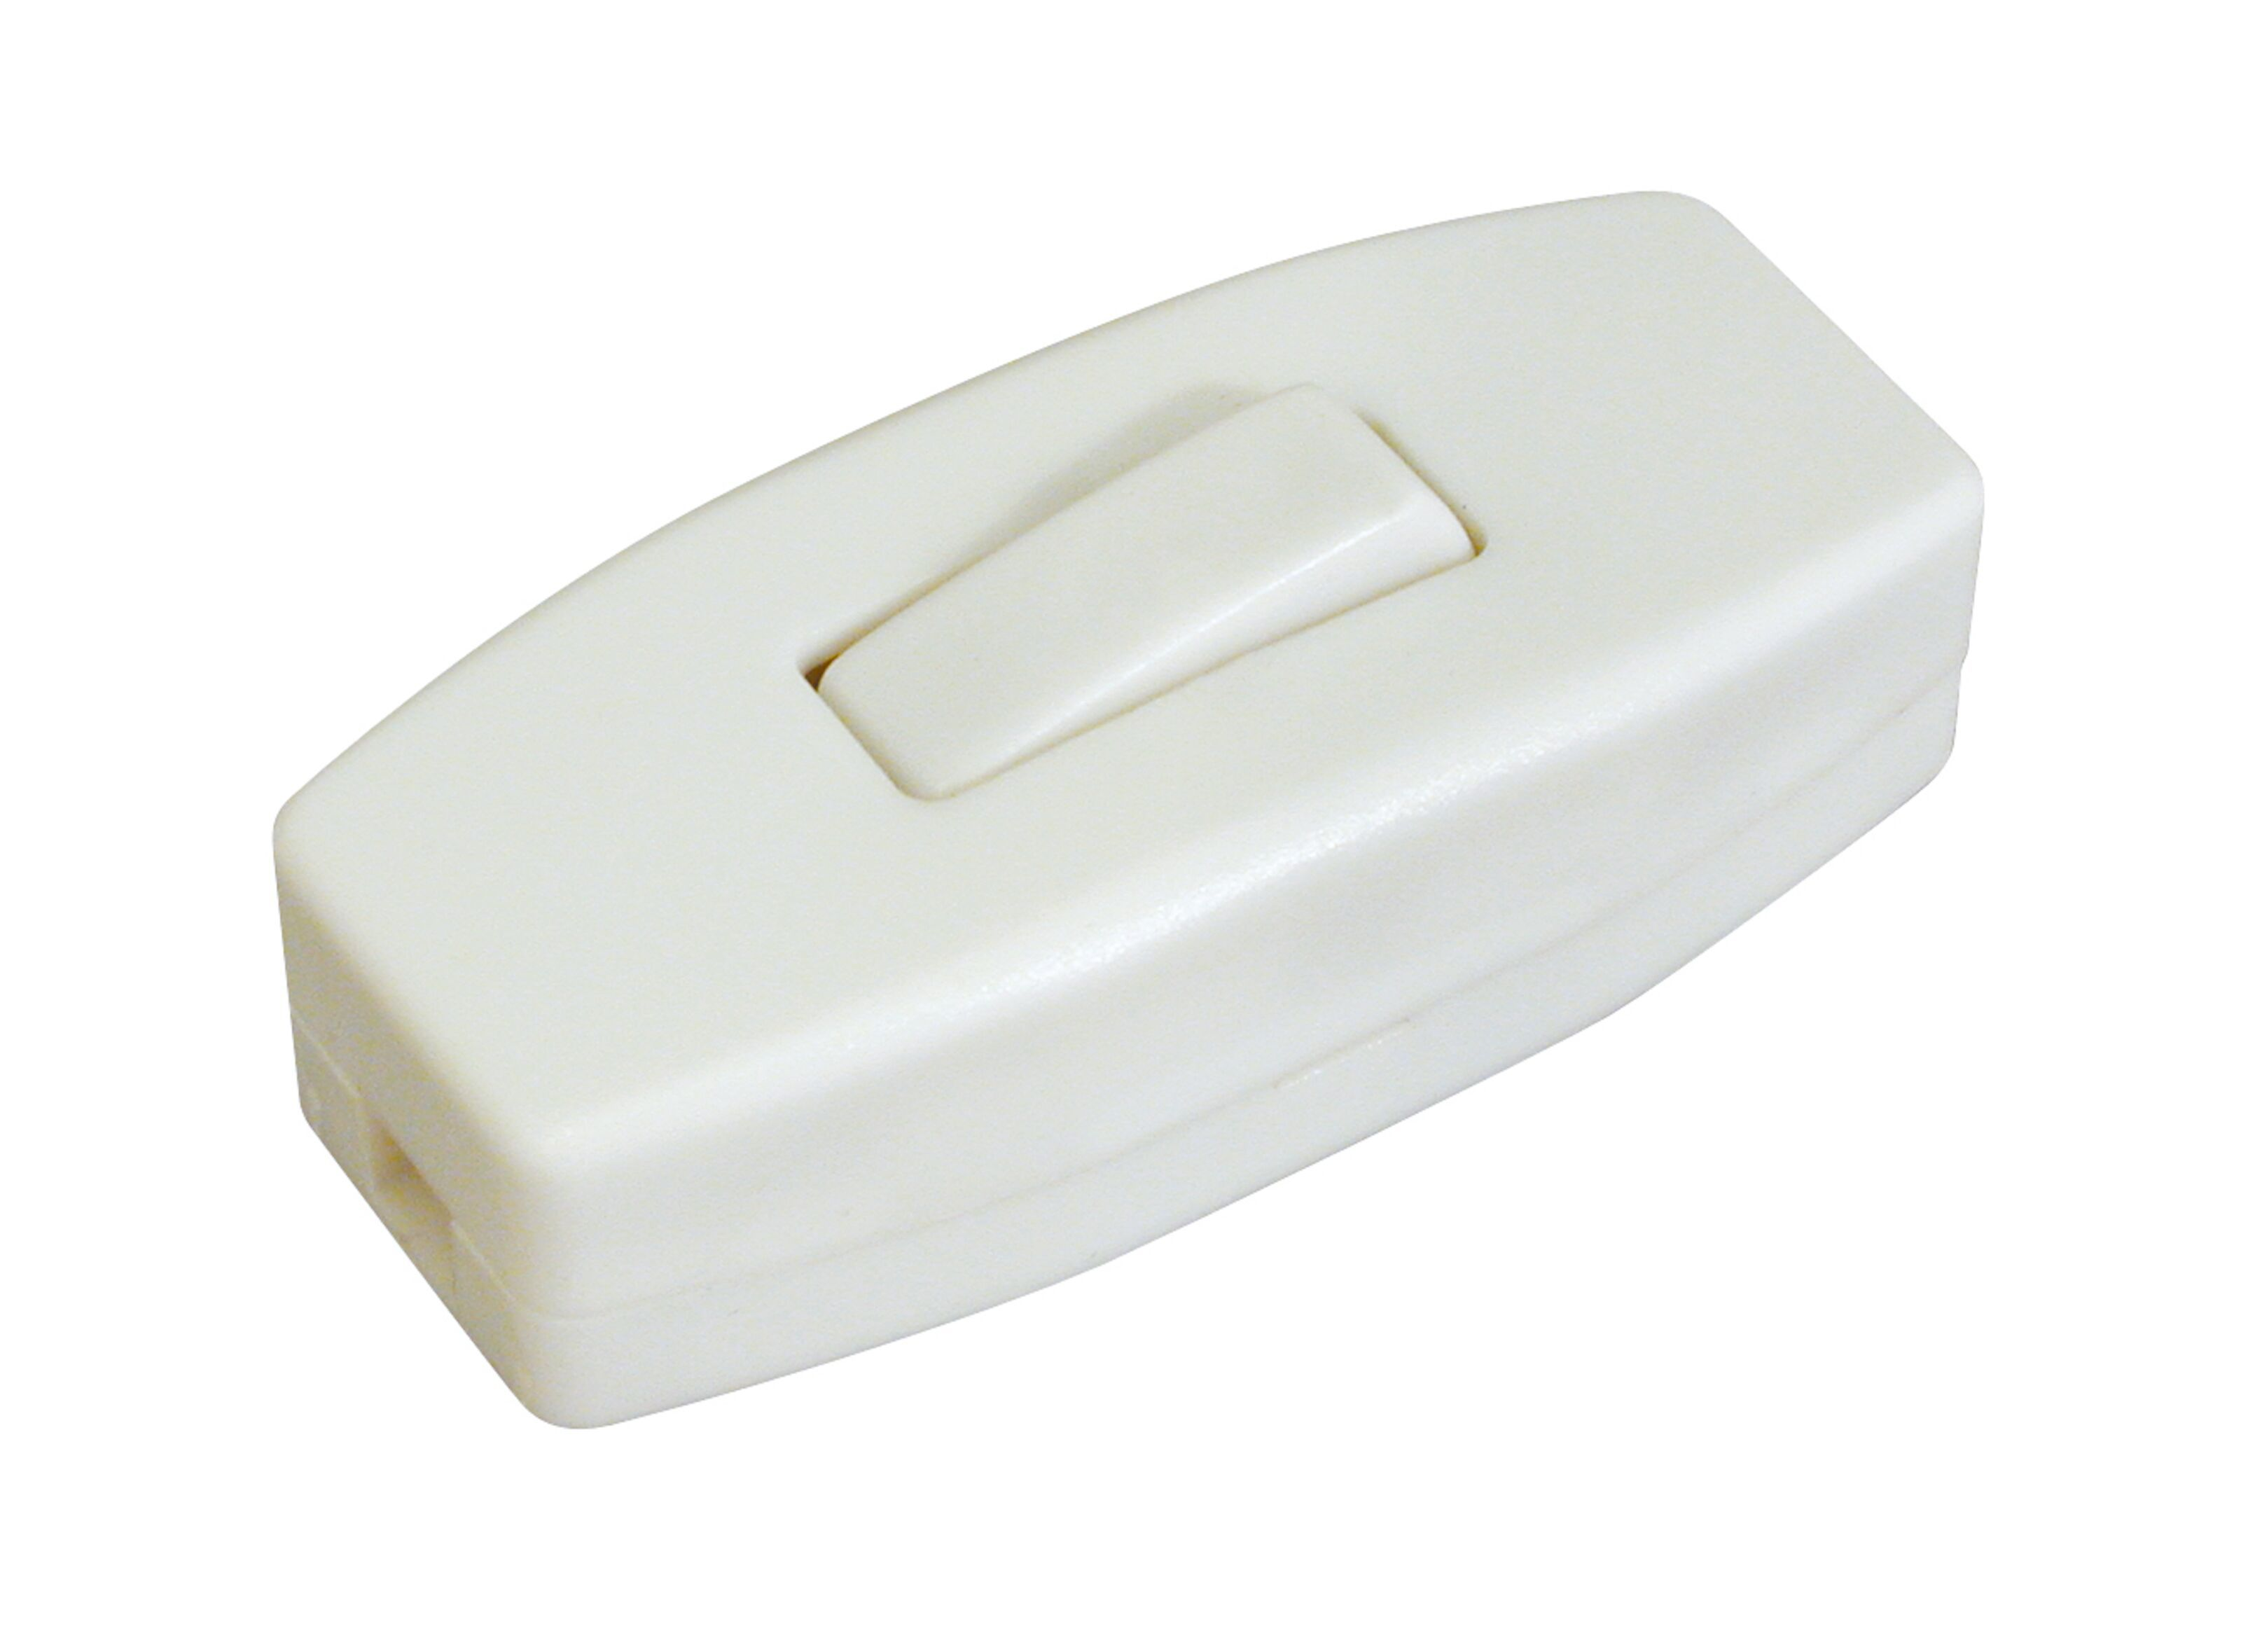 Cablecup Mini Hvit Ø125 mm Kabelmontering |